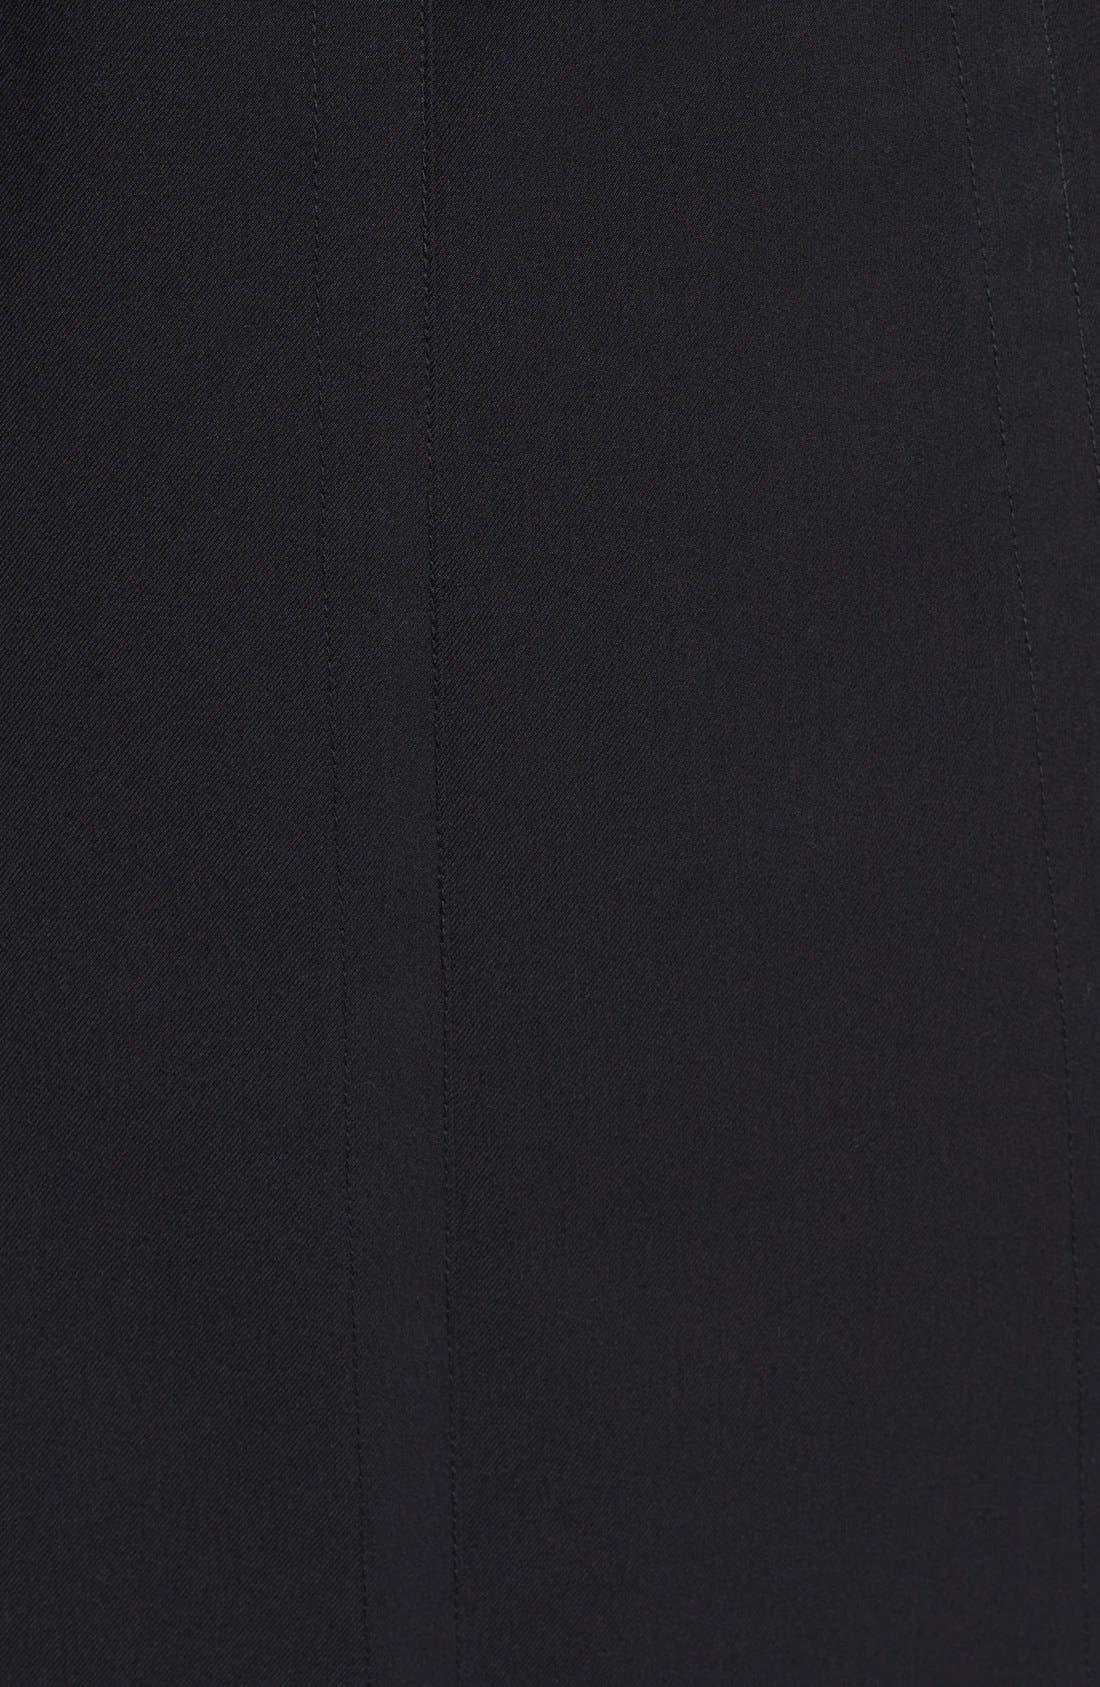 Alternate Image 2  - Kristen Blake Raincoat with Detachable Hood & Liner (Petite) (Nordstrom Exclusive)